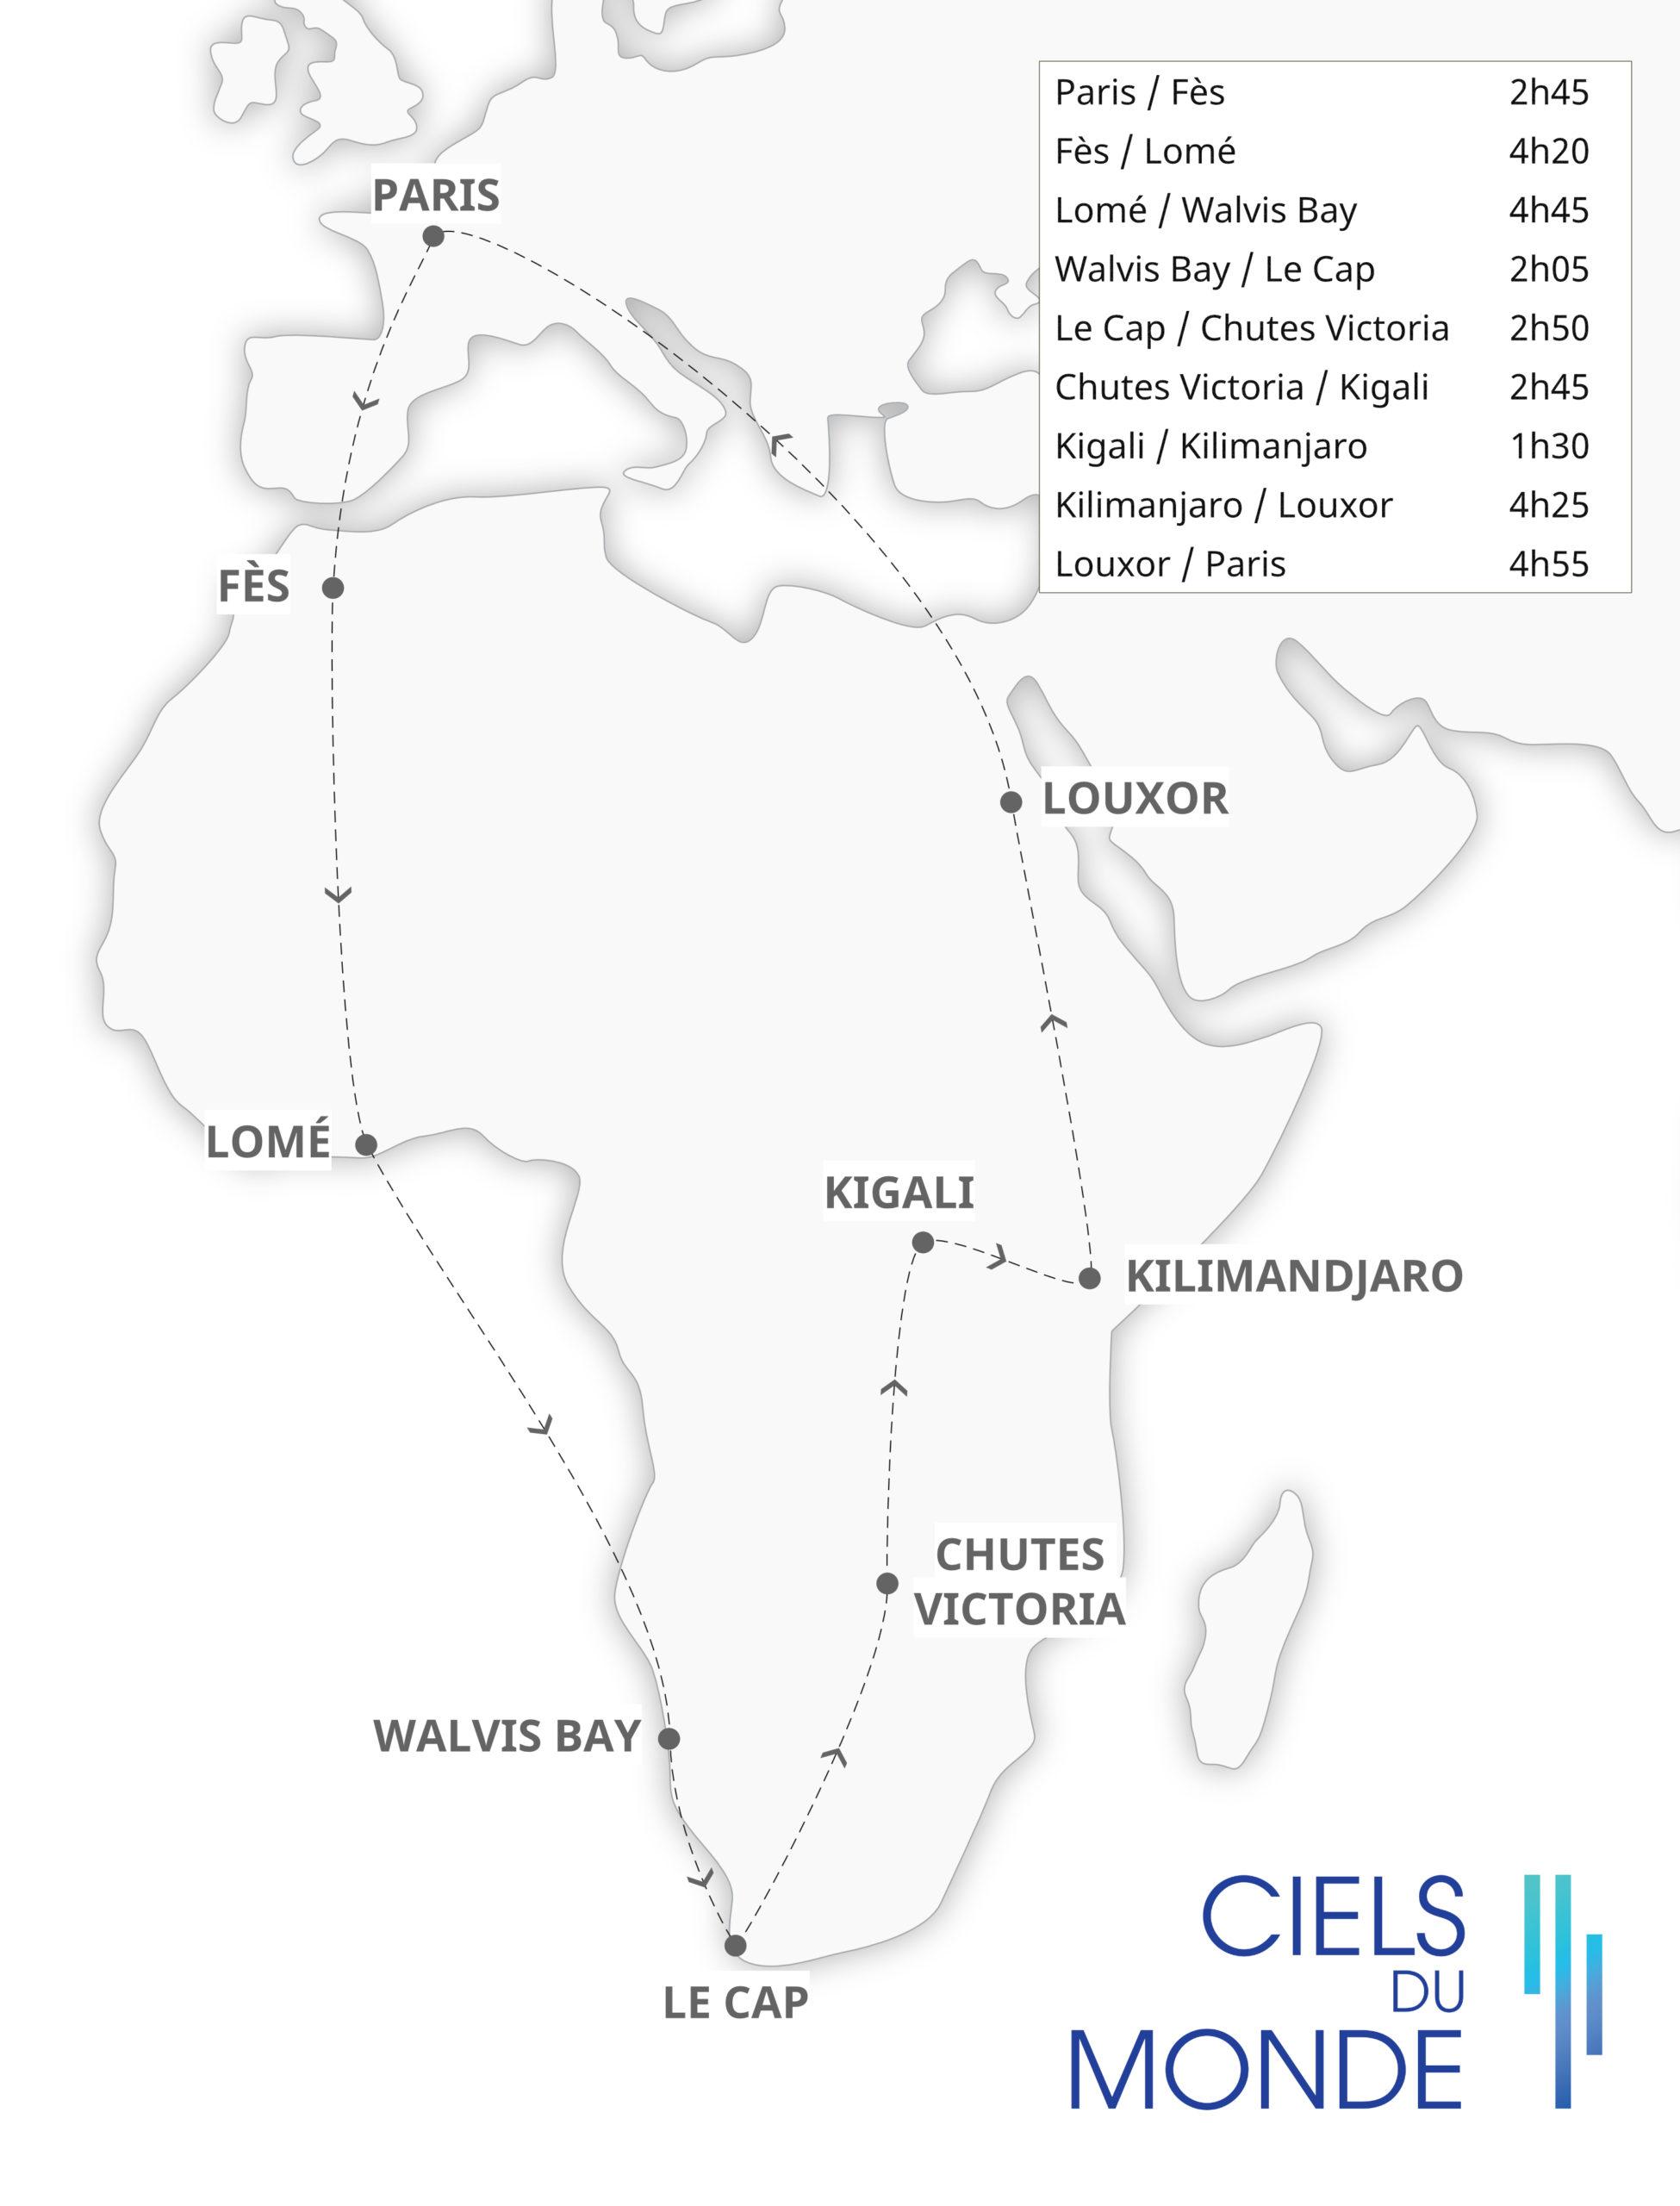 Odyssée Africaine - Temps de vol